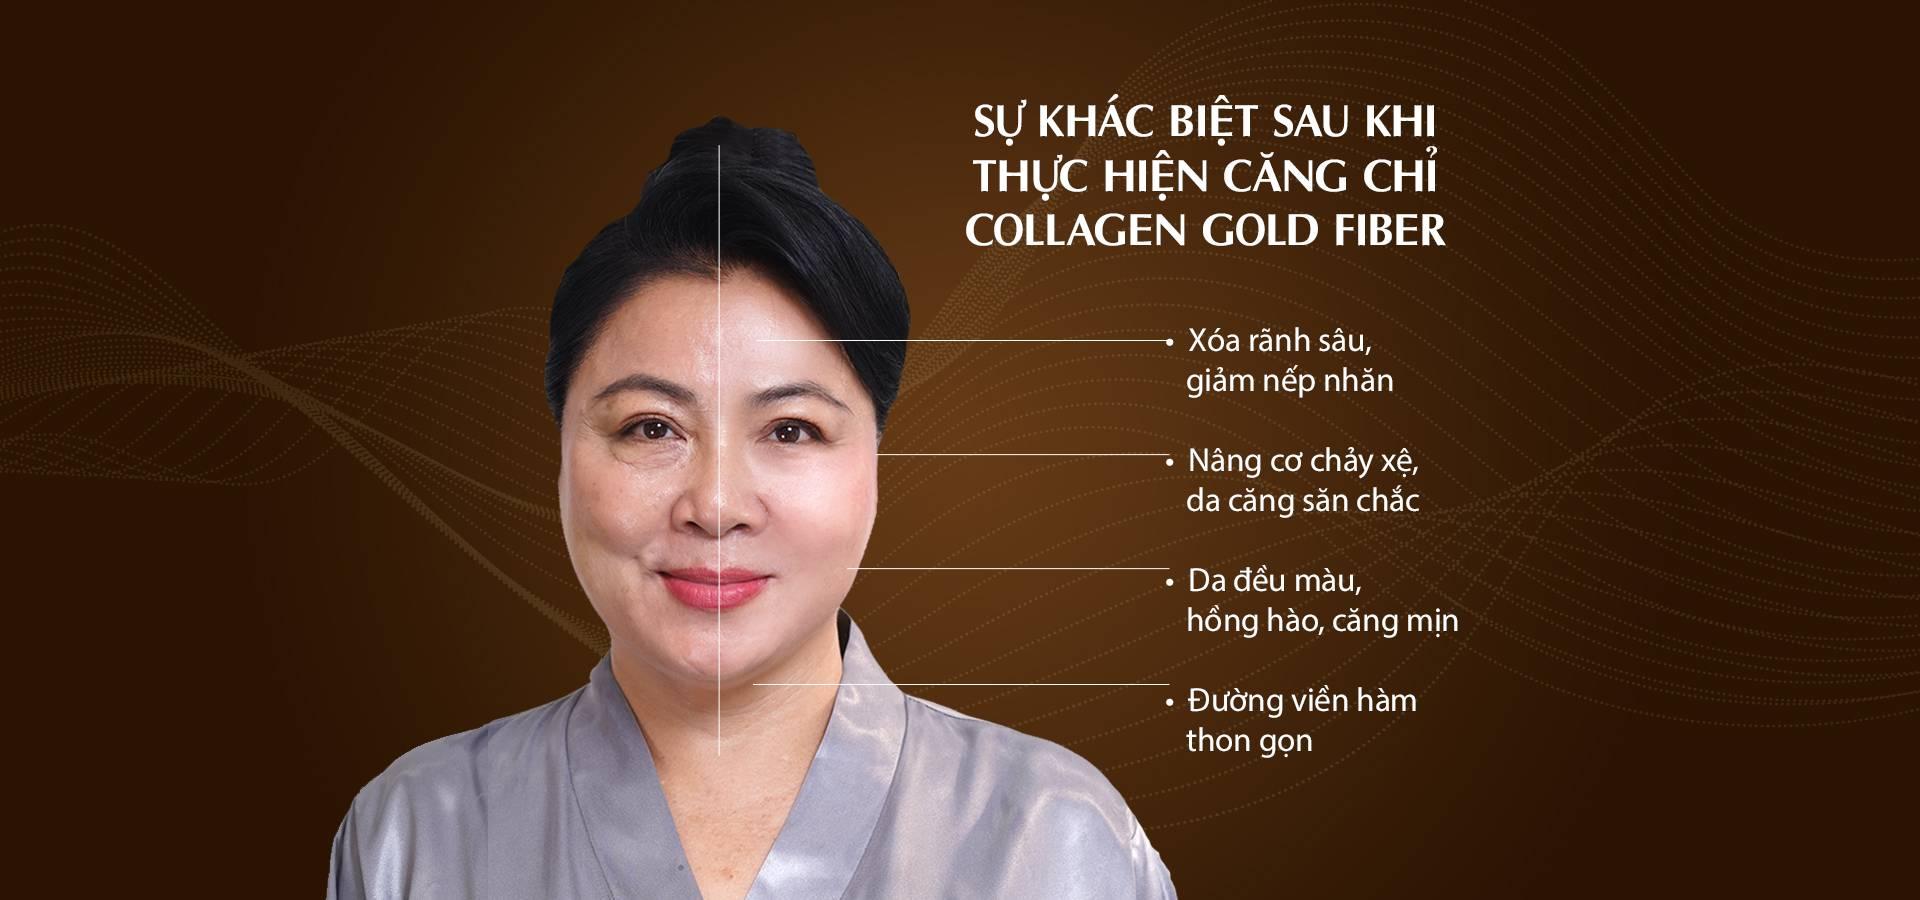 pc-su-khac-biet-sau-khi-cang-chi